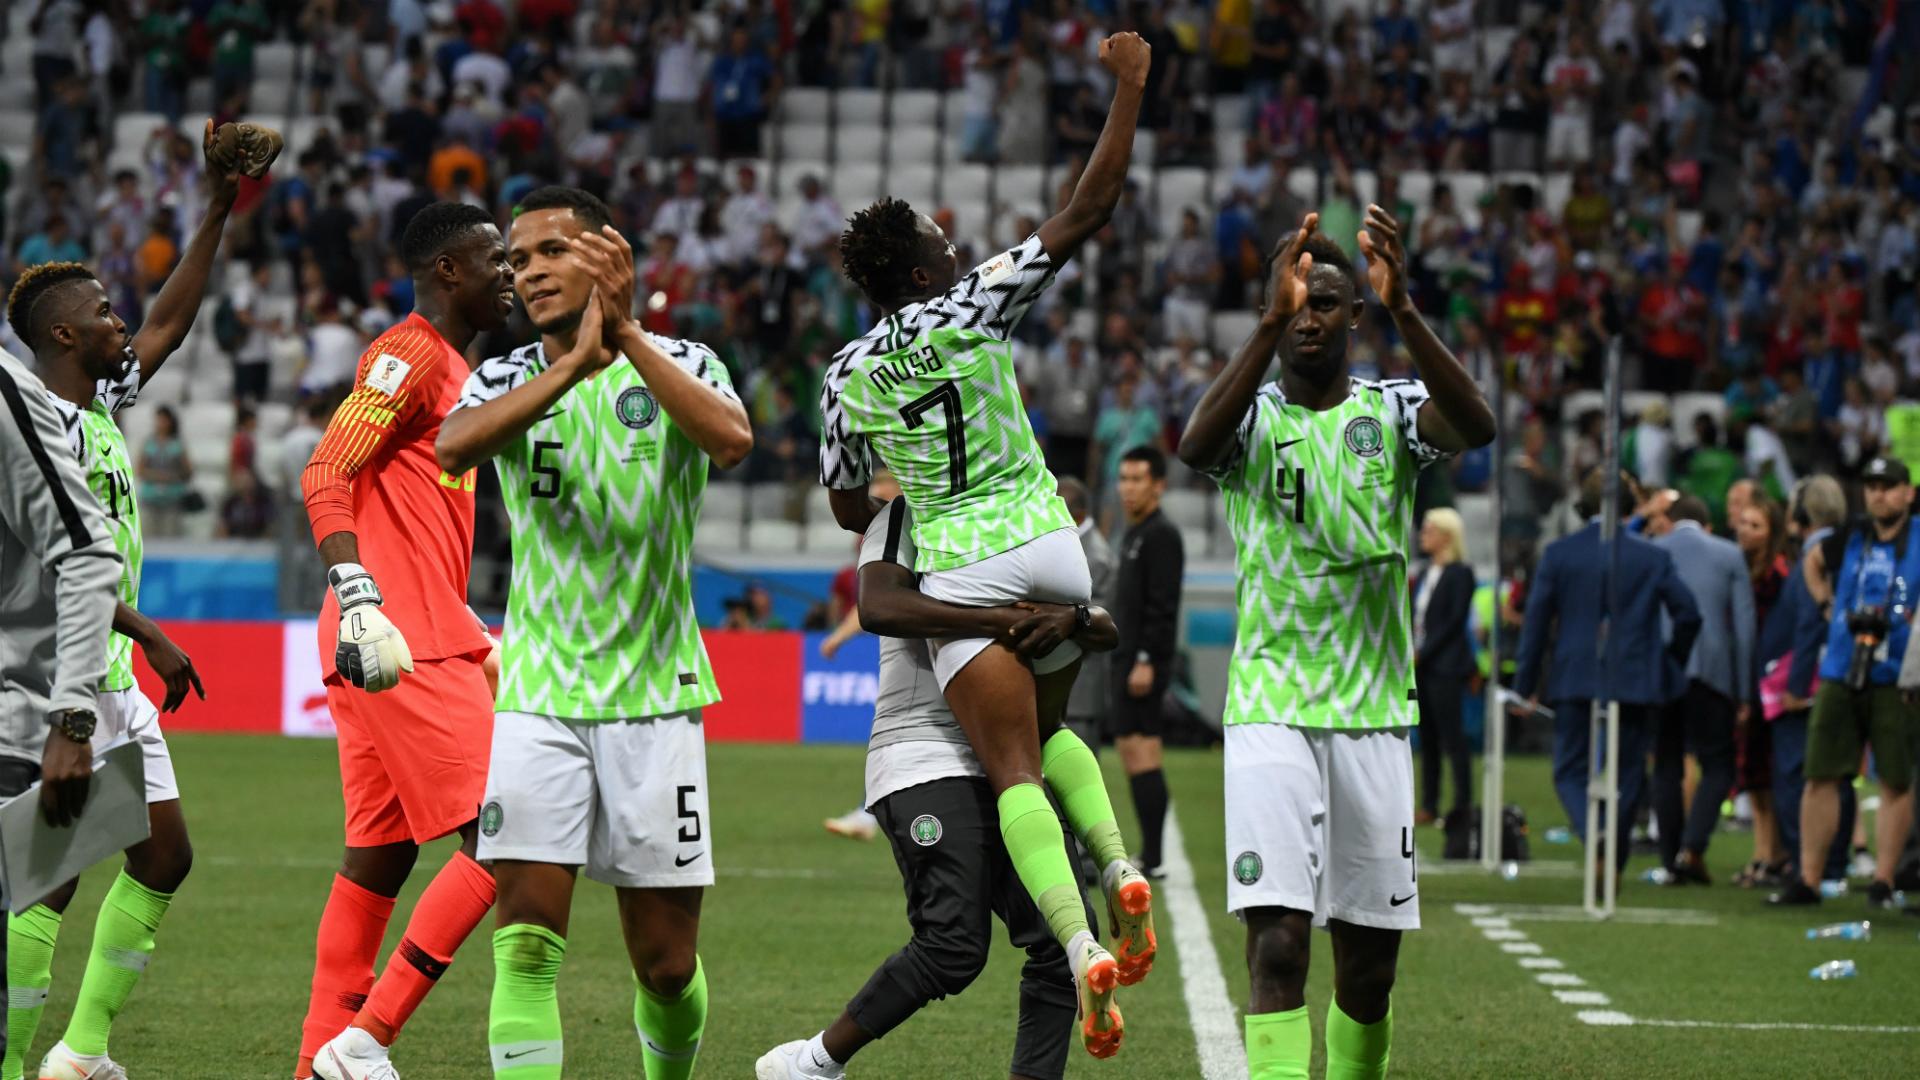 Nigeria Team News: Rohr sticks with winning formula vs. Argentina